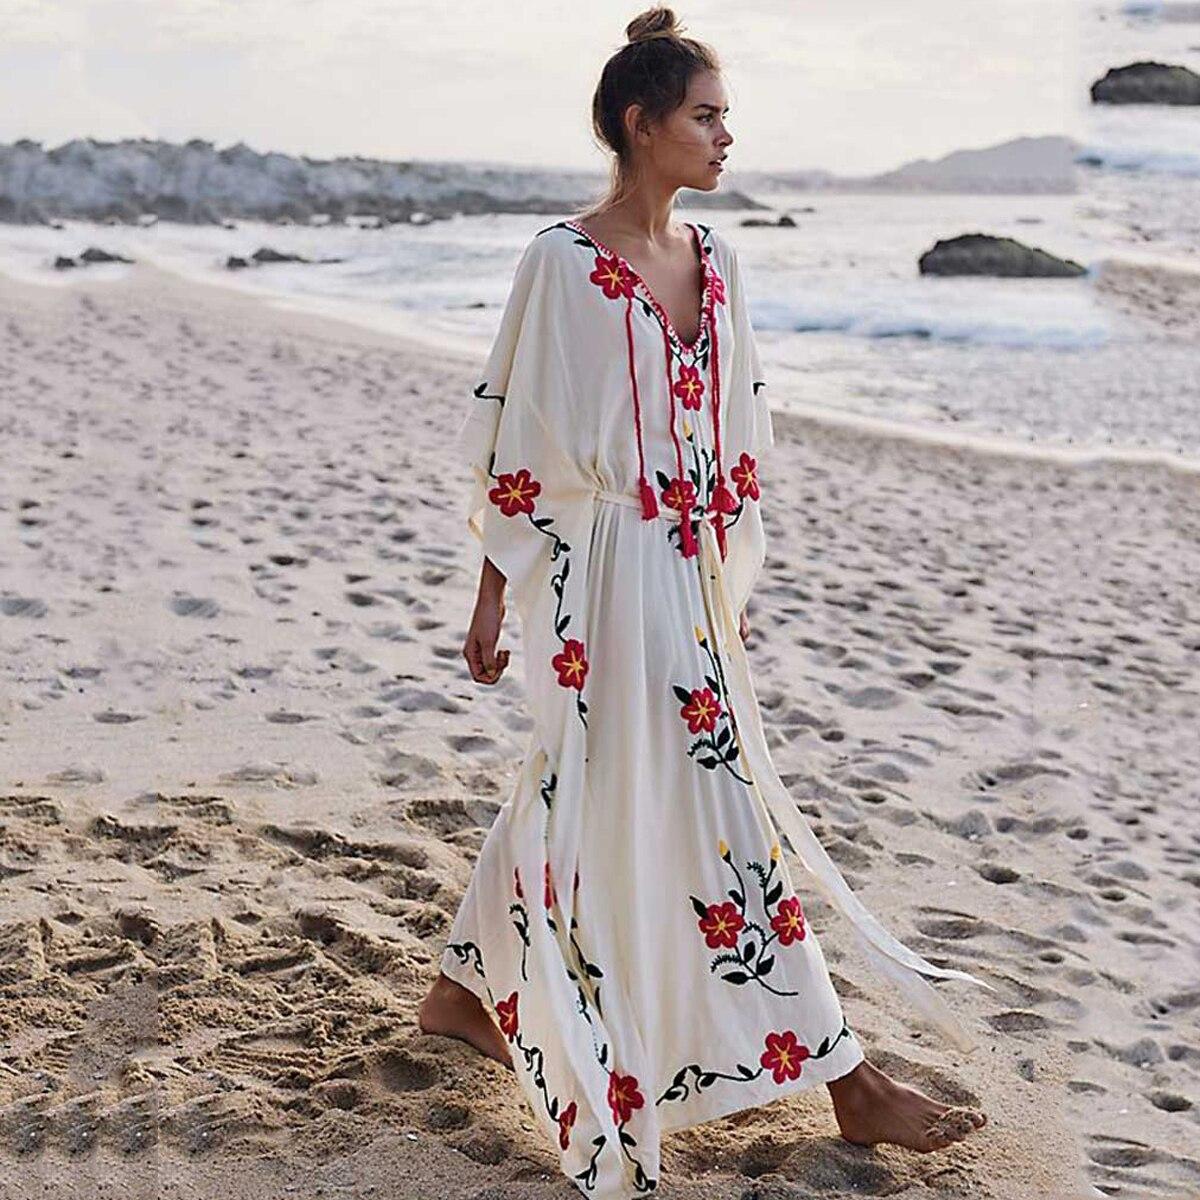 Jastie boho 꽃 수 놓은 kaftan 여성 드레스 v 목 tassels 여름 드레스 대형 batwing 슬리브 수영복 비치 드레스-에서드레스부터 여성 의류 의  그룹 1